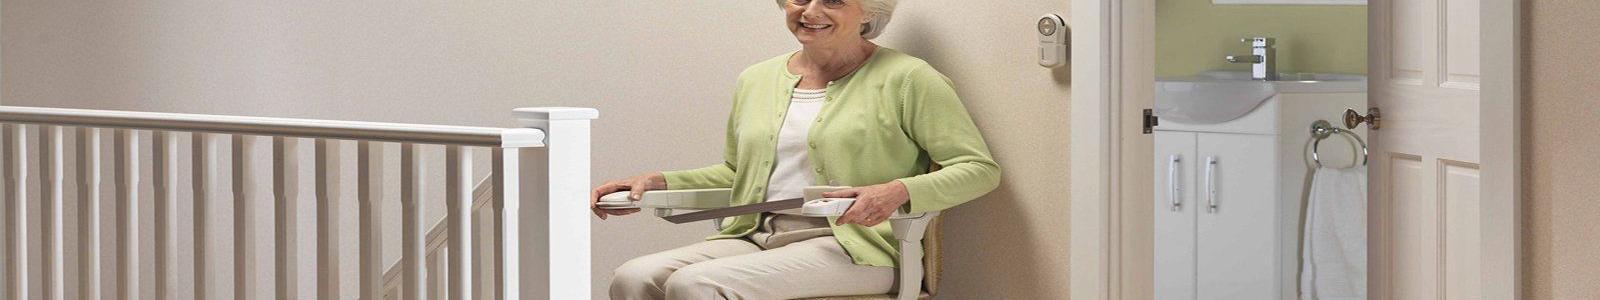 engelli 1600x300 - Engelli Sistemleri